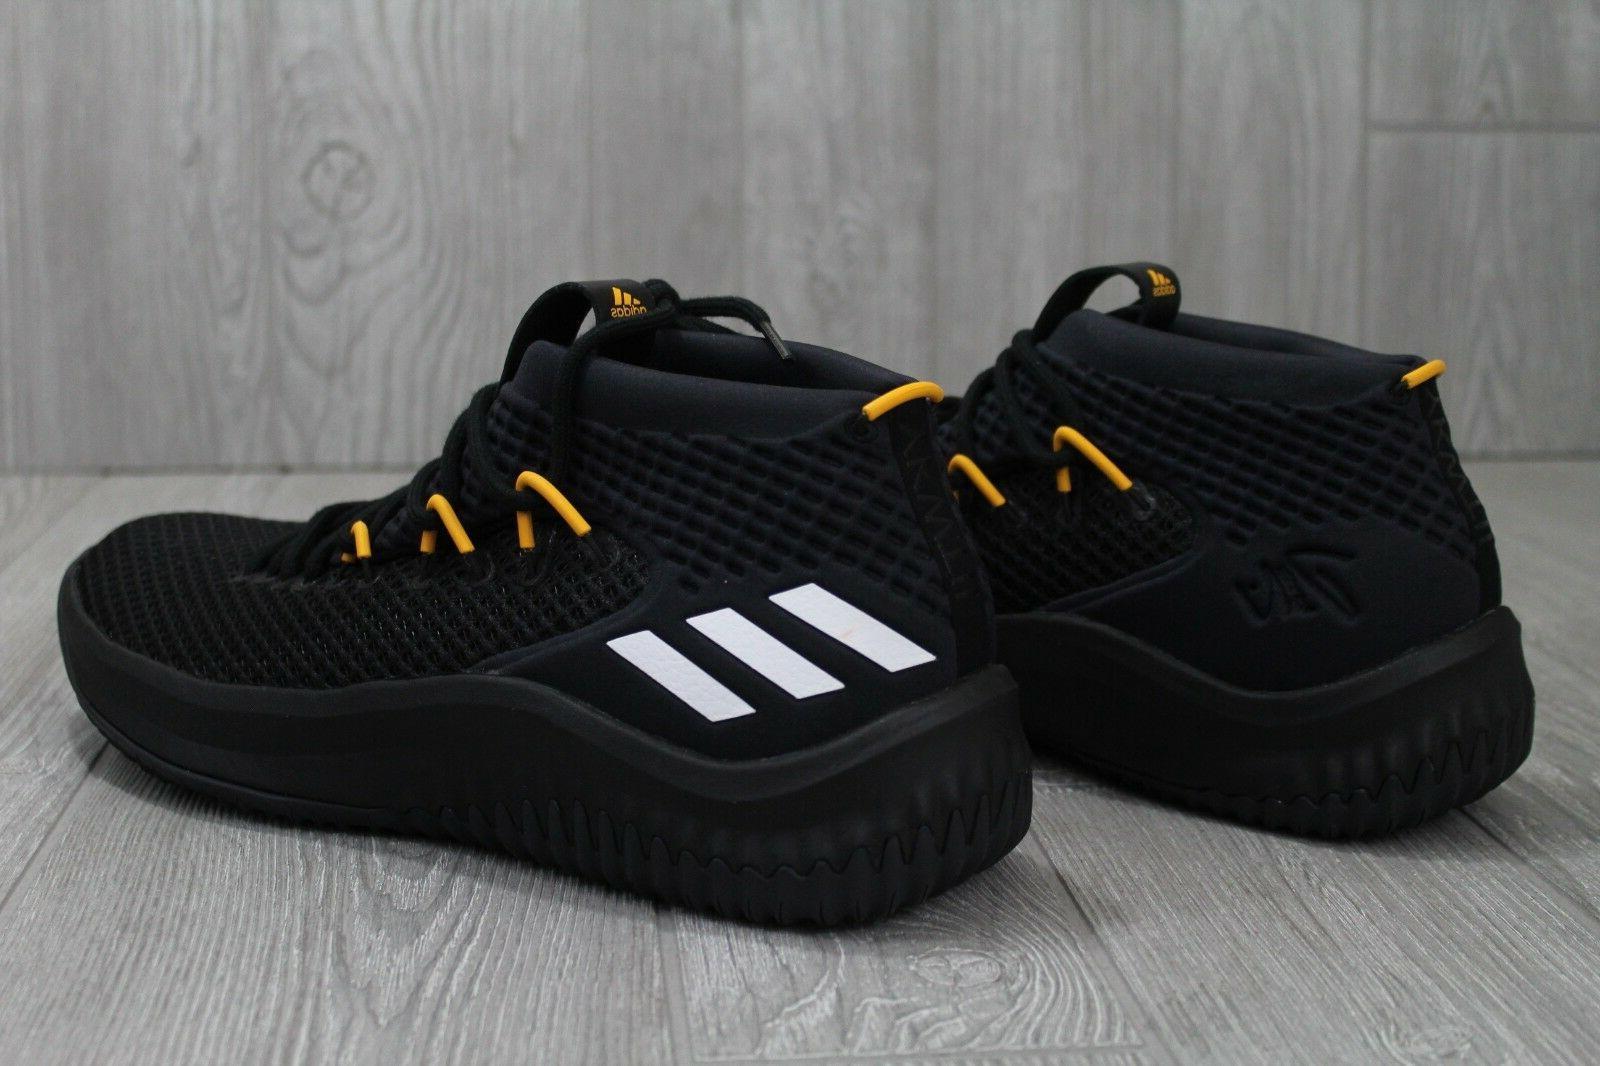 32 Adidas Black Yellow PE Basketball AC7293 Size 12.5 13 14